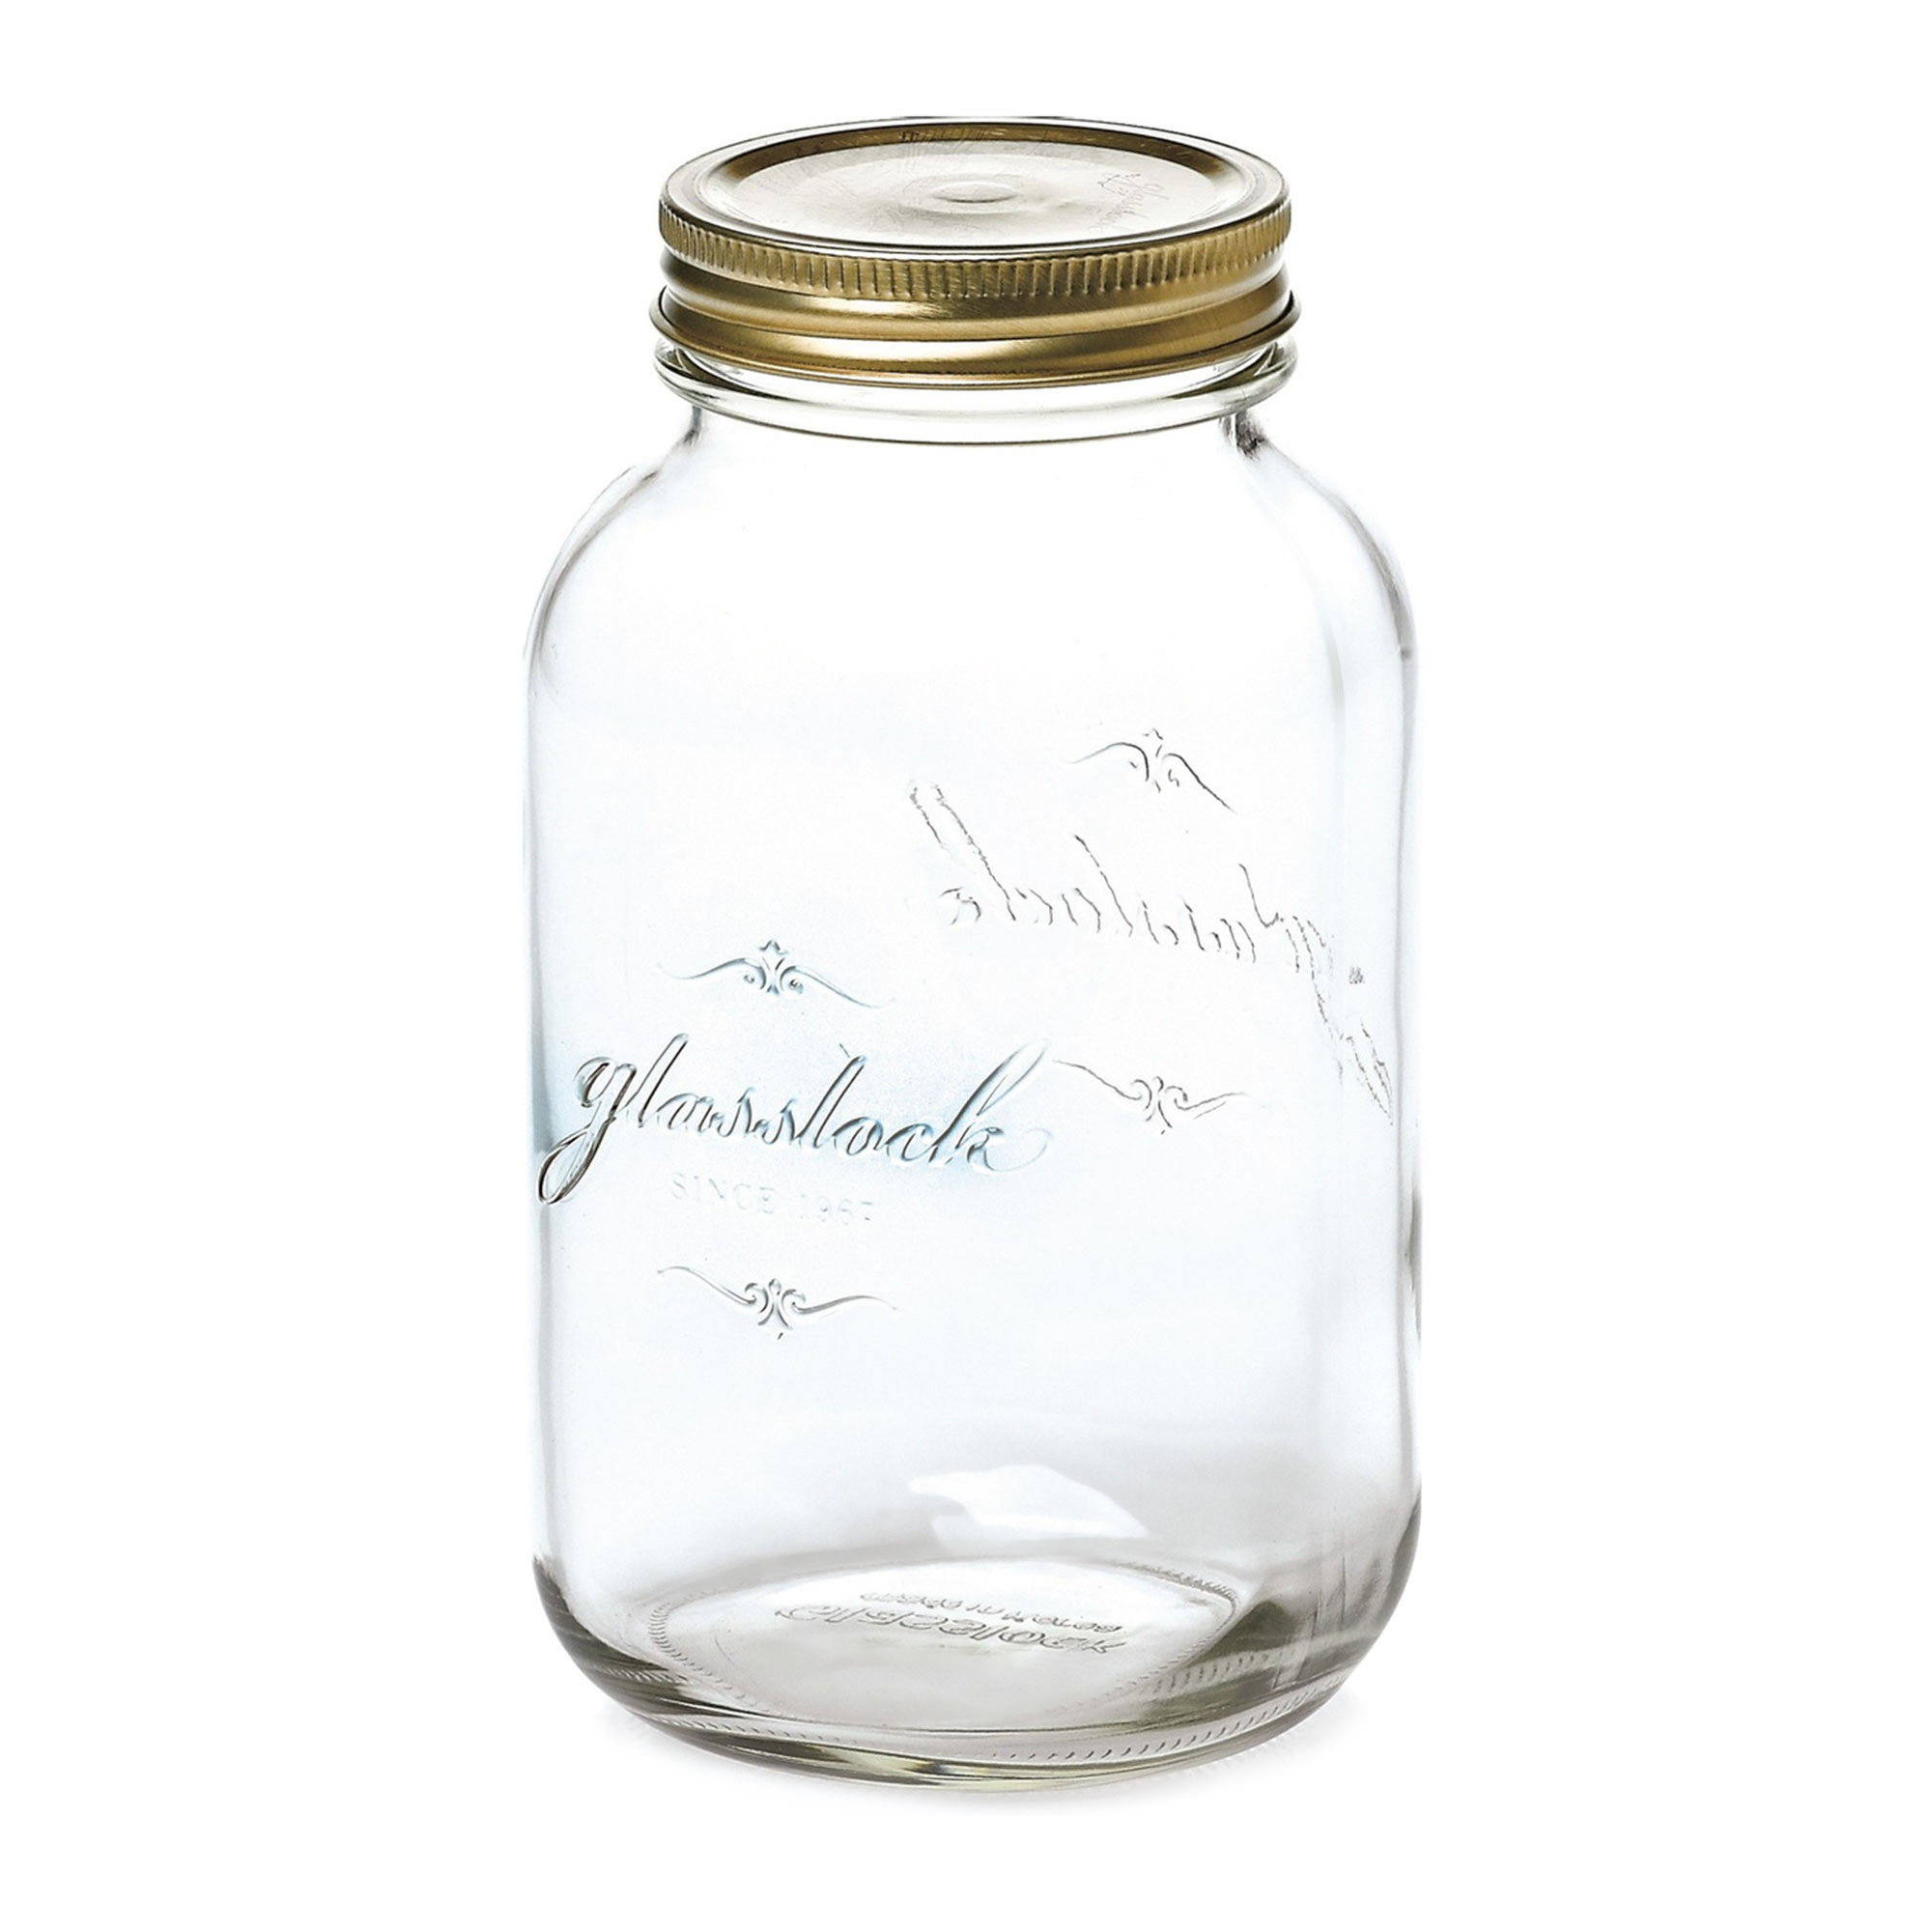 Фото - Банка для хранения Glasslock IP-626H 500 мл банка для хранения солений ягод варенья 4 л 16х13 5х29 см ip 636 glasslock